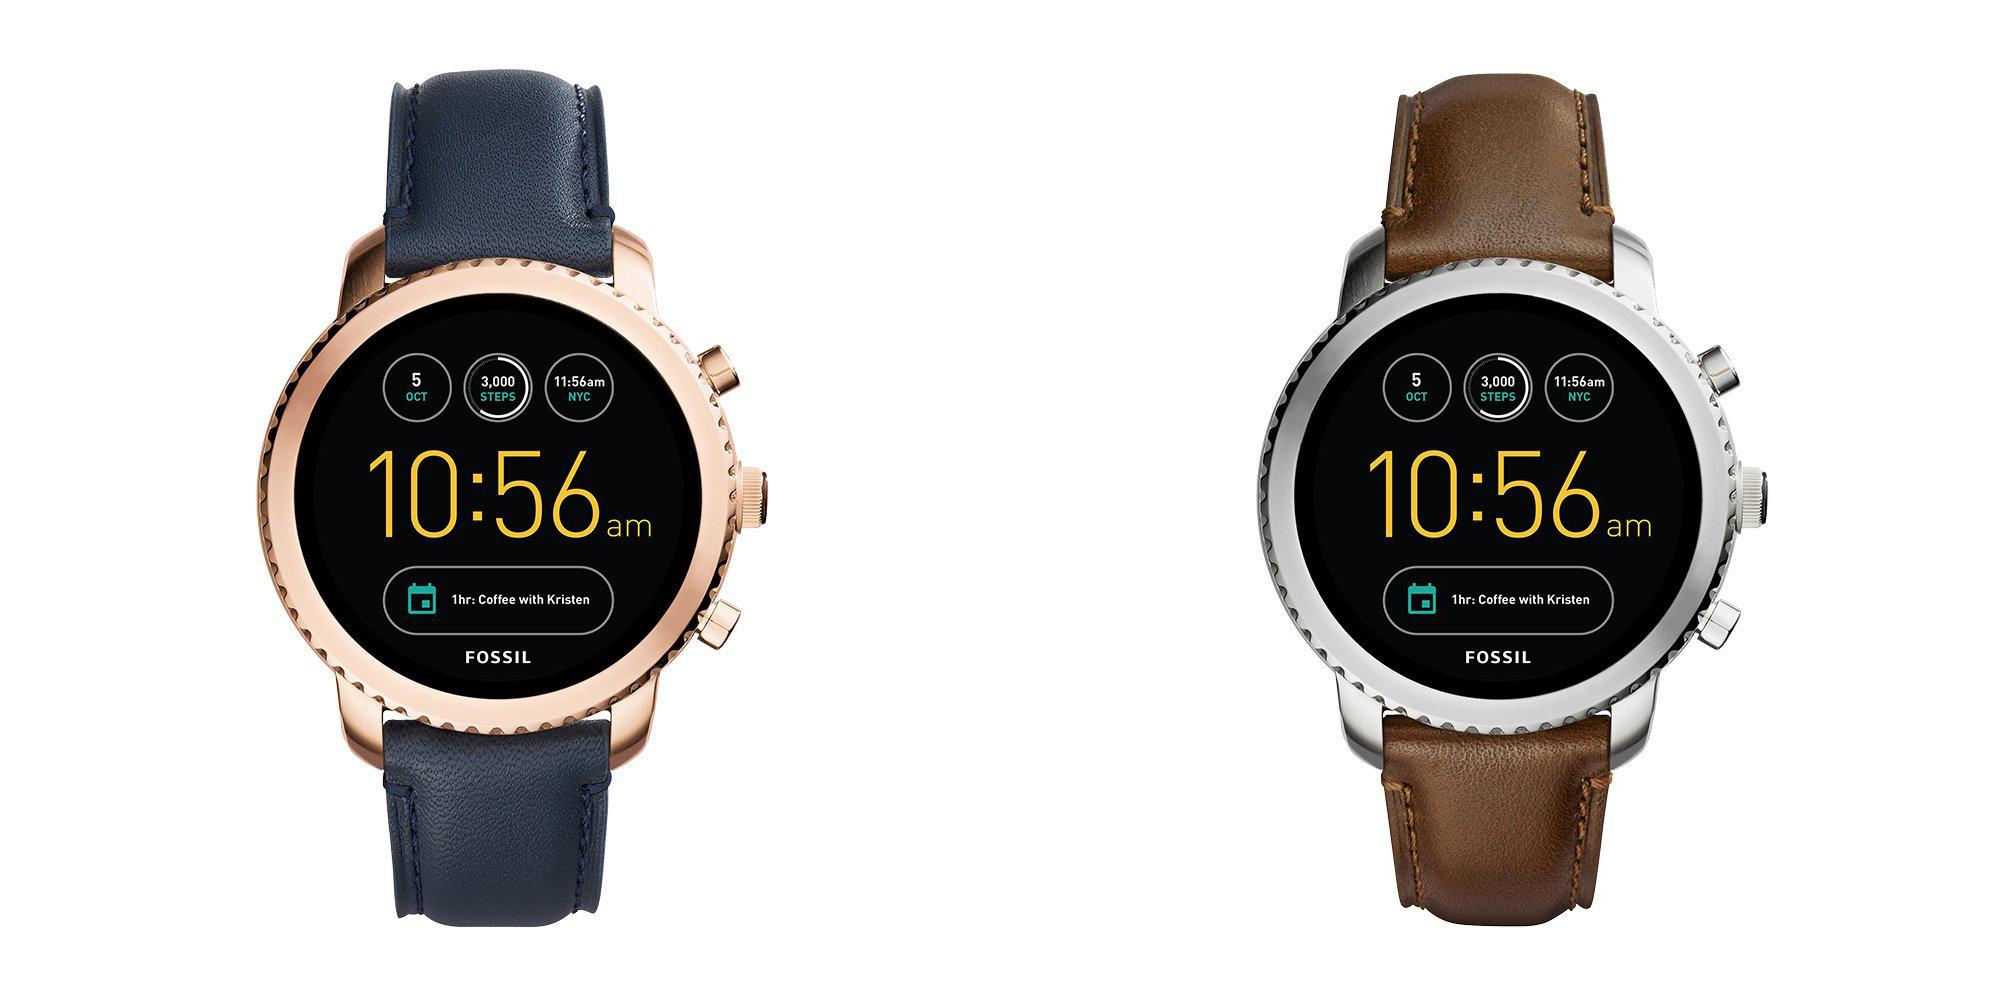 WearOS awaits w/ Fossil's Gen 3 Explorist Smartwatch for $156.50 (Reg. $180+)